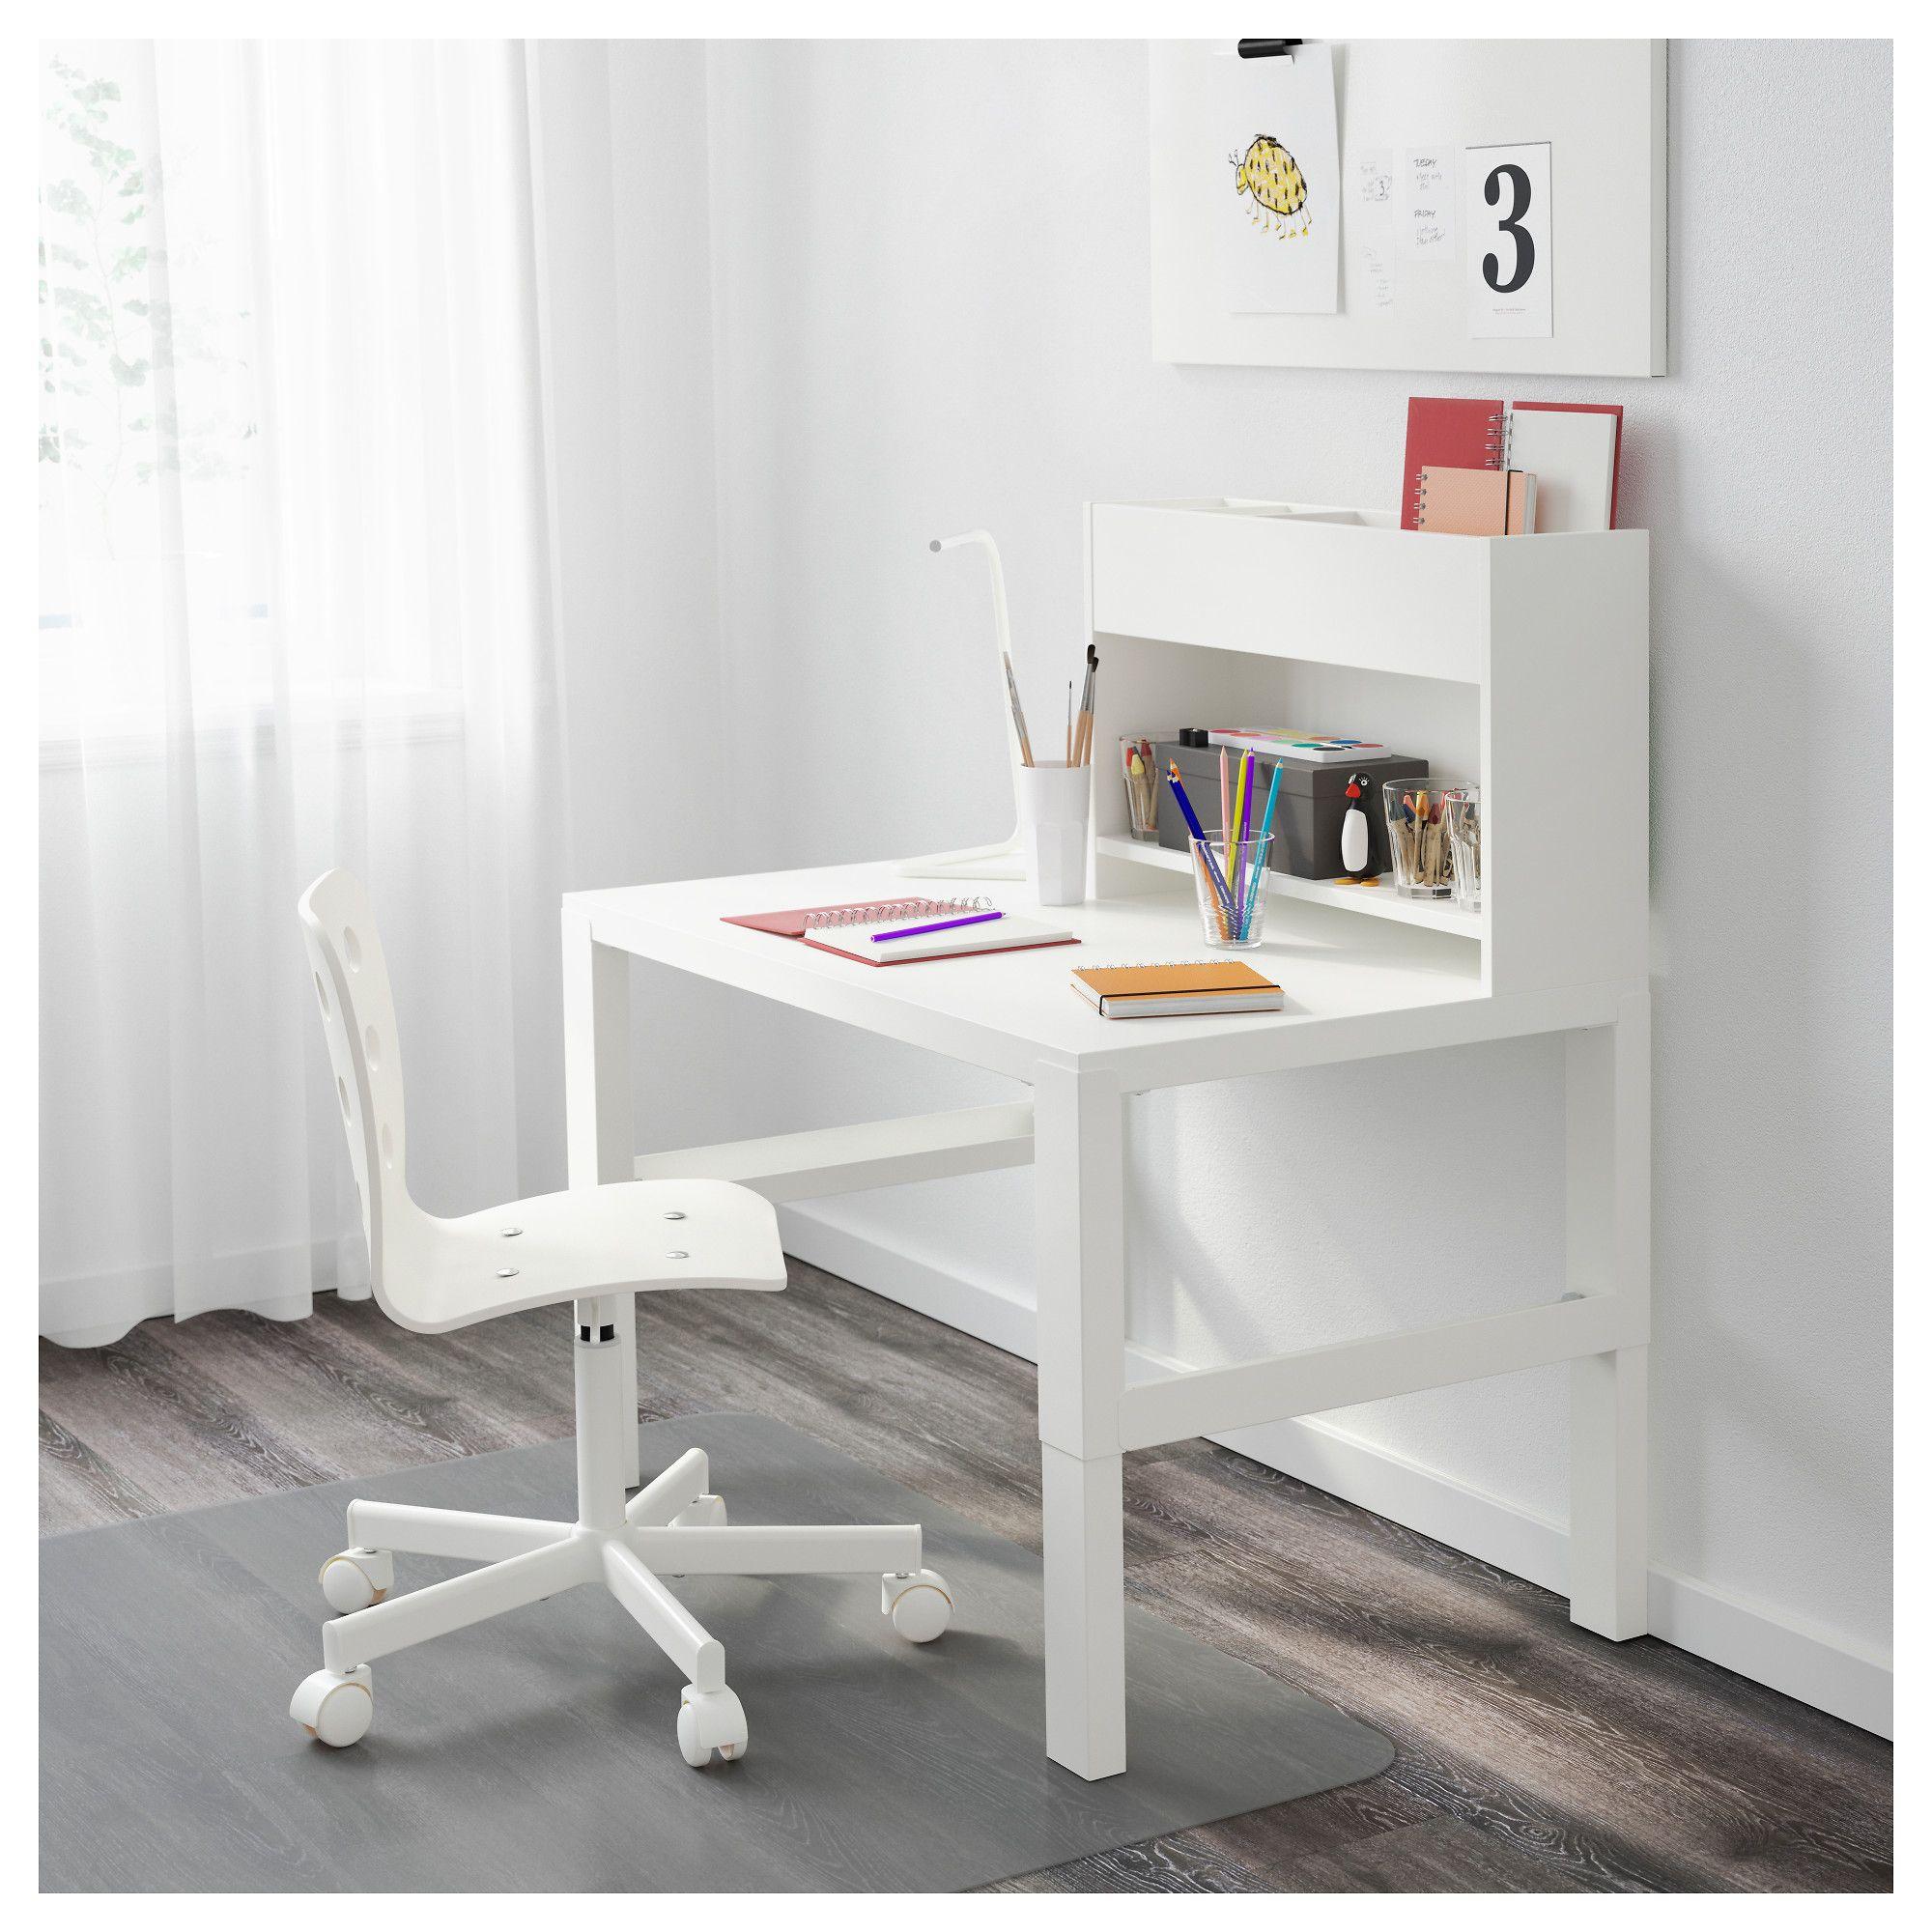 Pahl Escritorio Modulo Adicional Blanco 96x58 Cm Ikea Childrens Desk And Chair Desk Shelves Desk